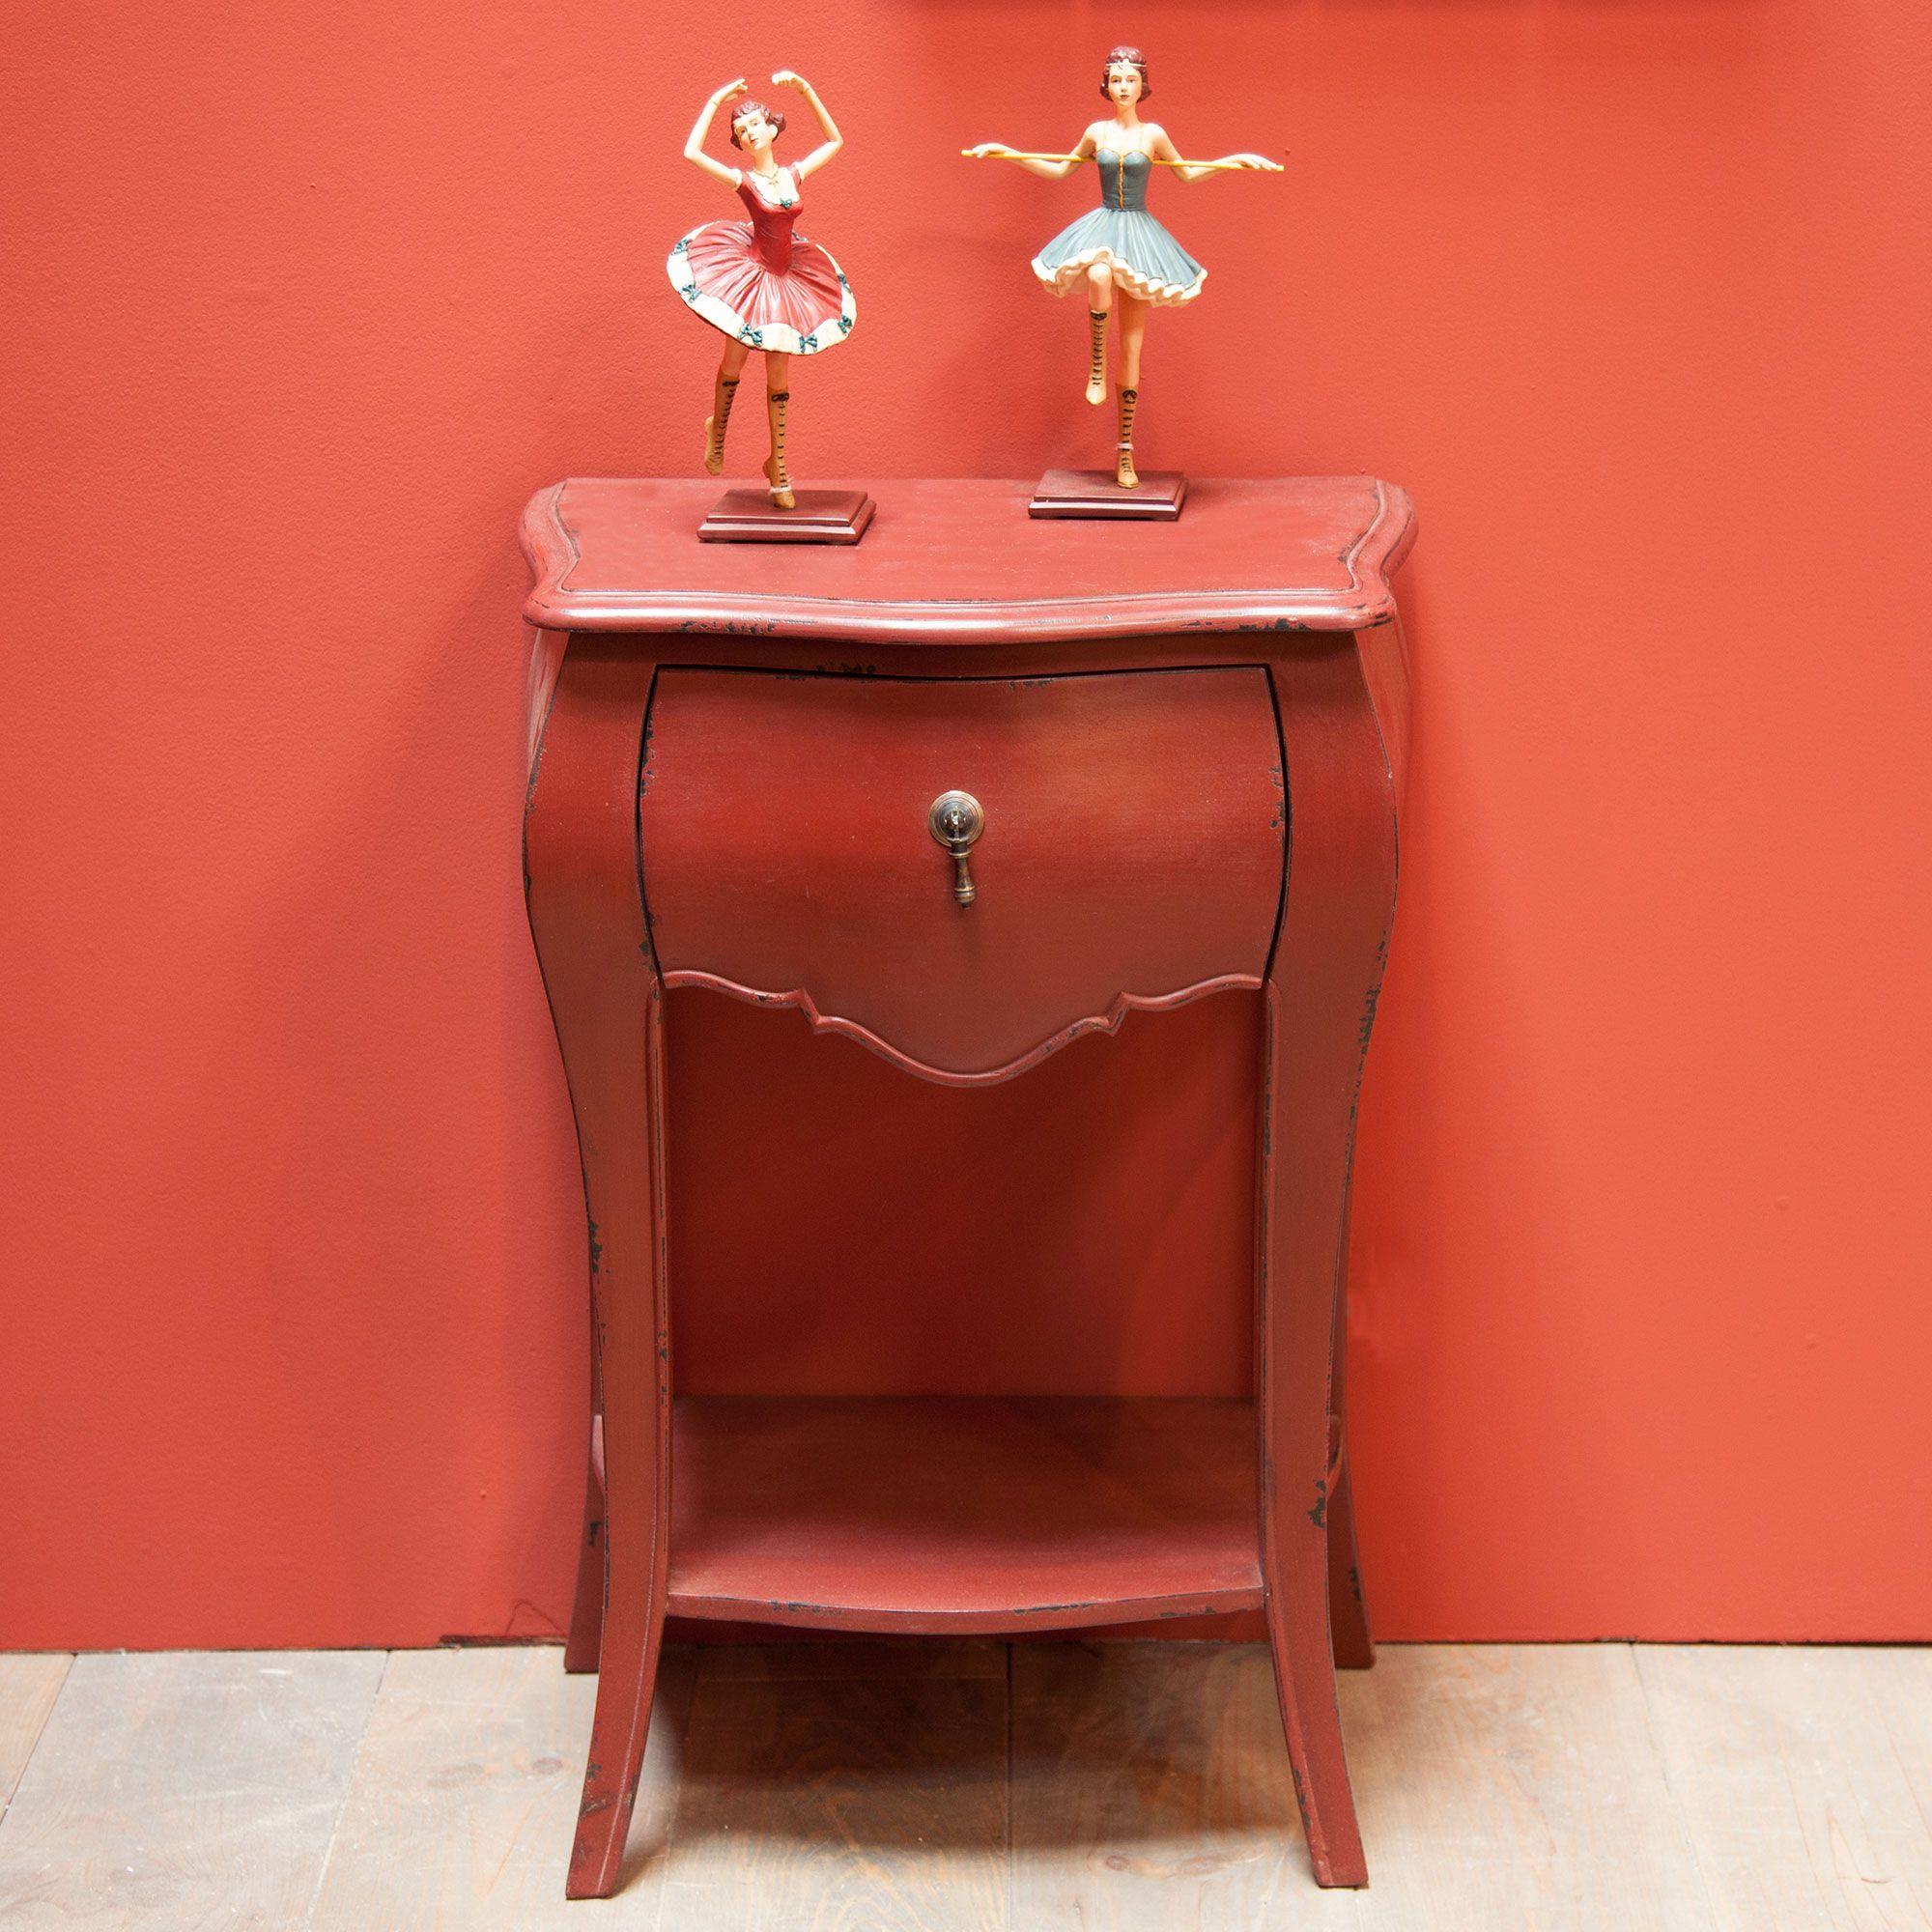 Chevet 1 tiroir bois patin rouge murano rouge amadeus Meuble patine rouge